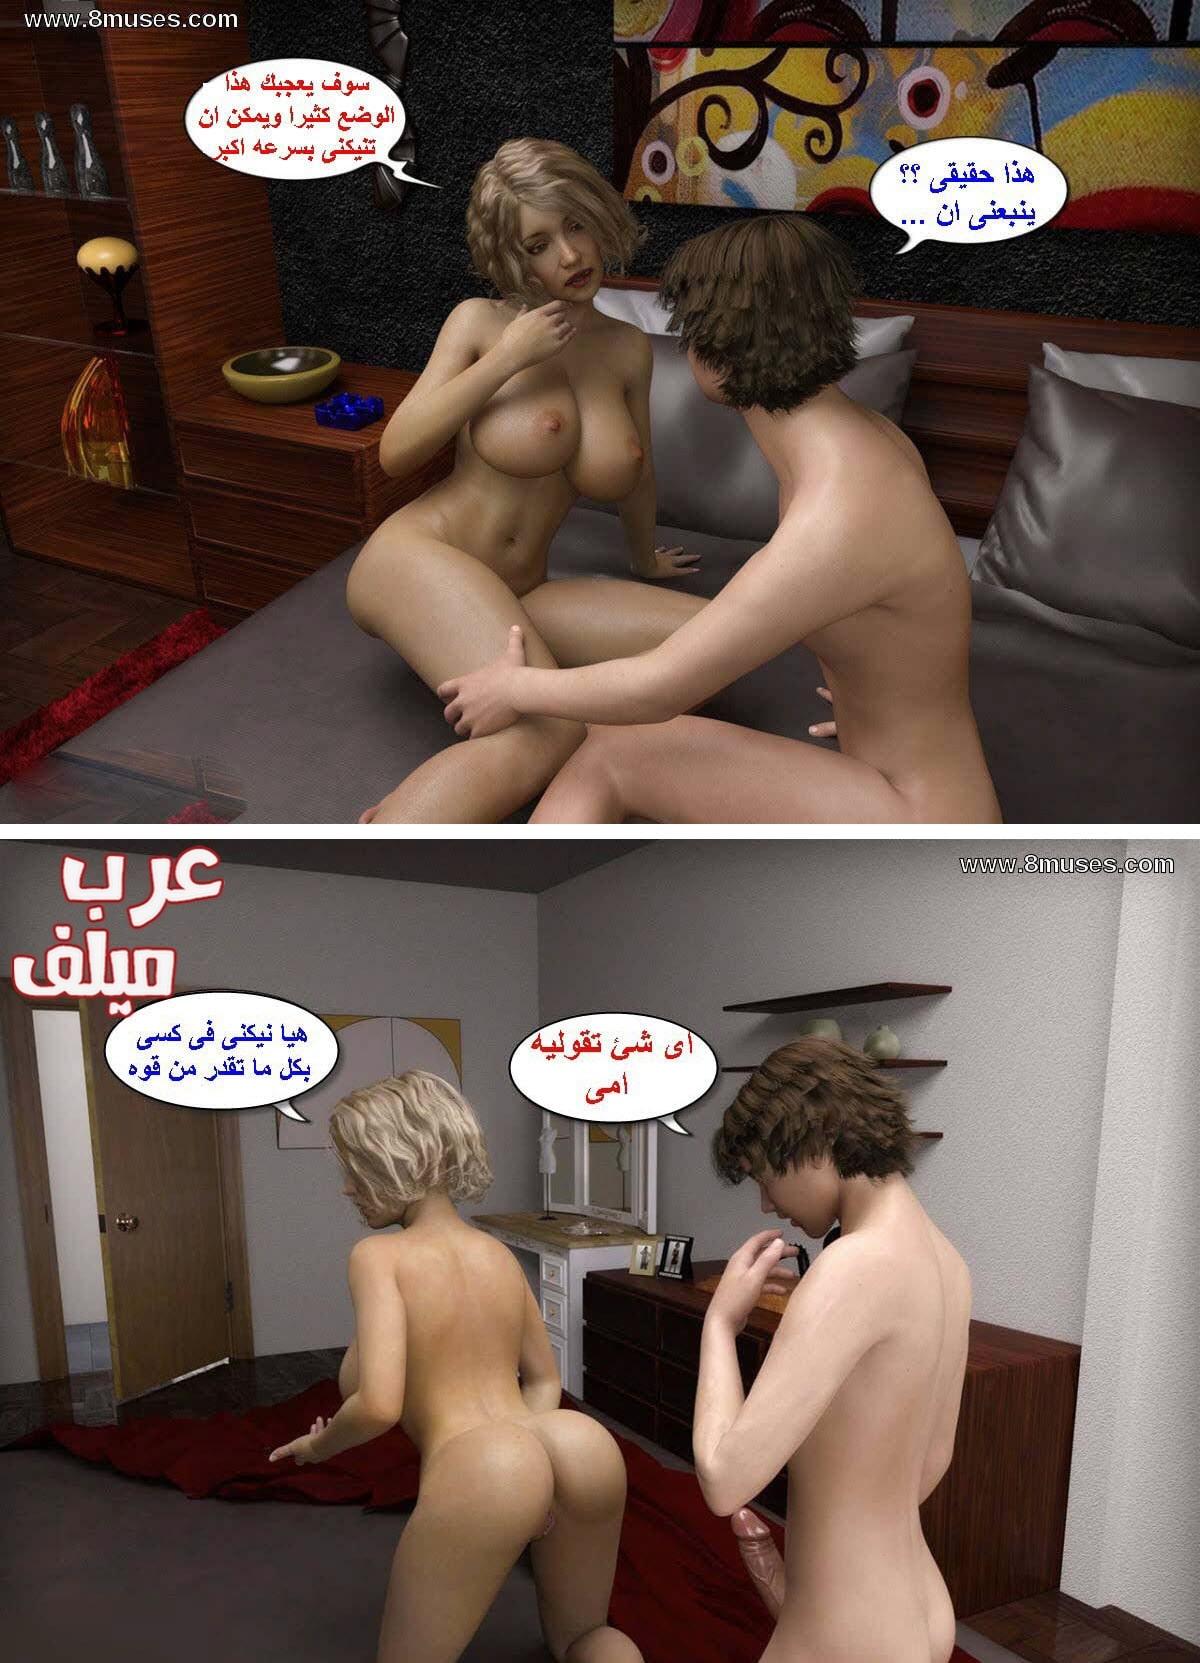 قصص نيك مترجمة ميلف تون عربي